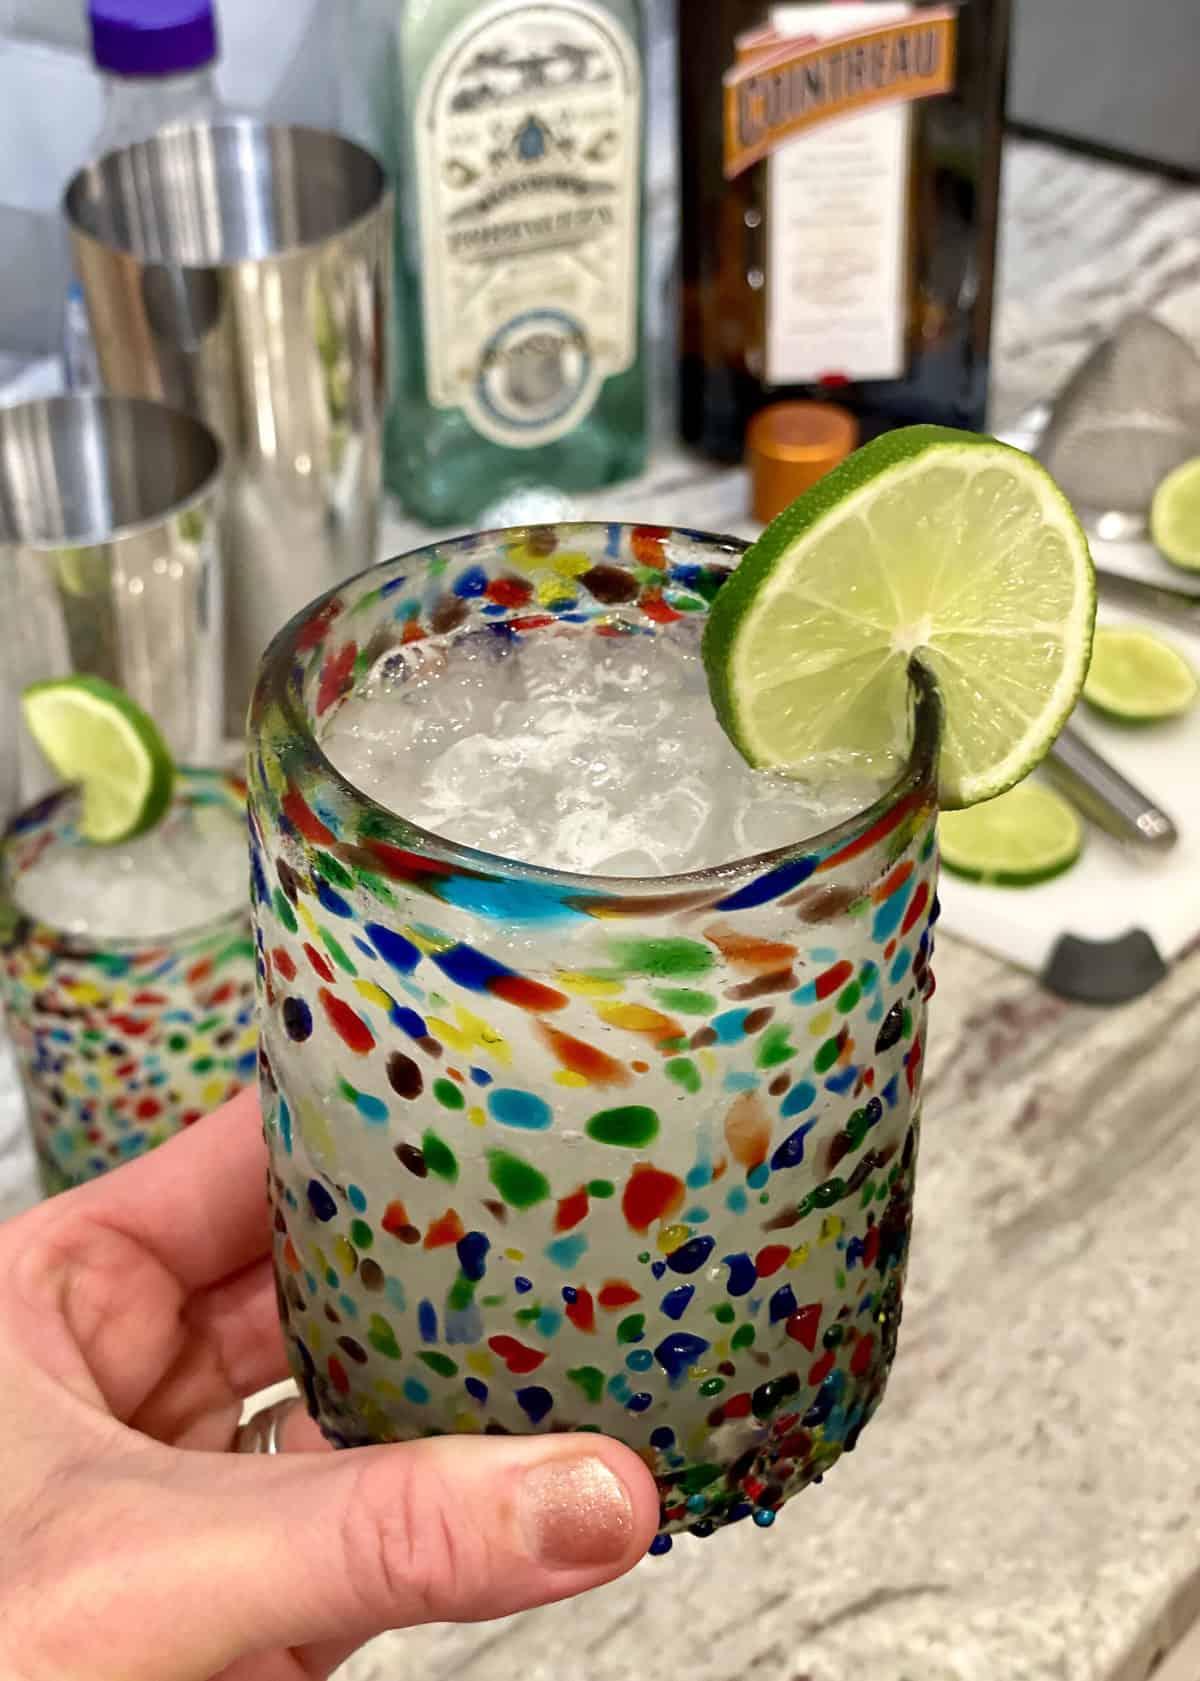 Brandon's Best Margarita by The BakerMama